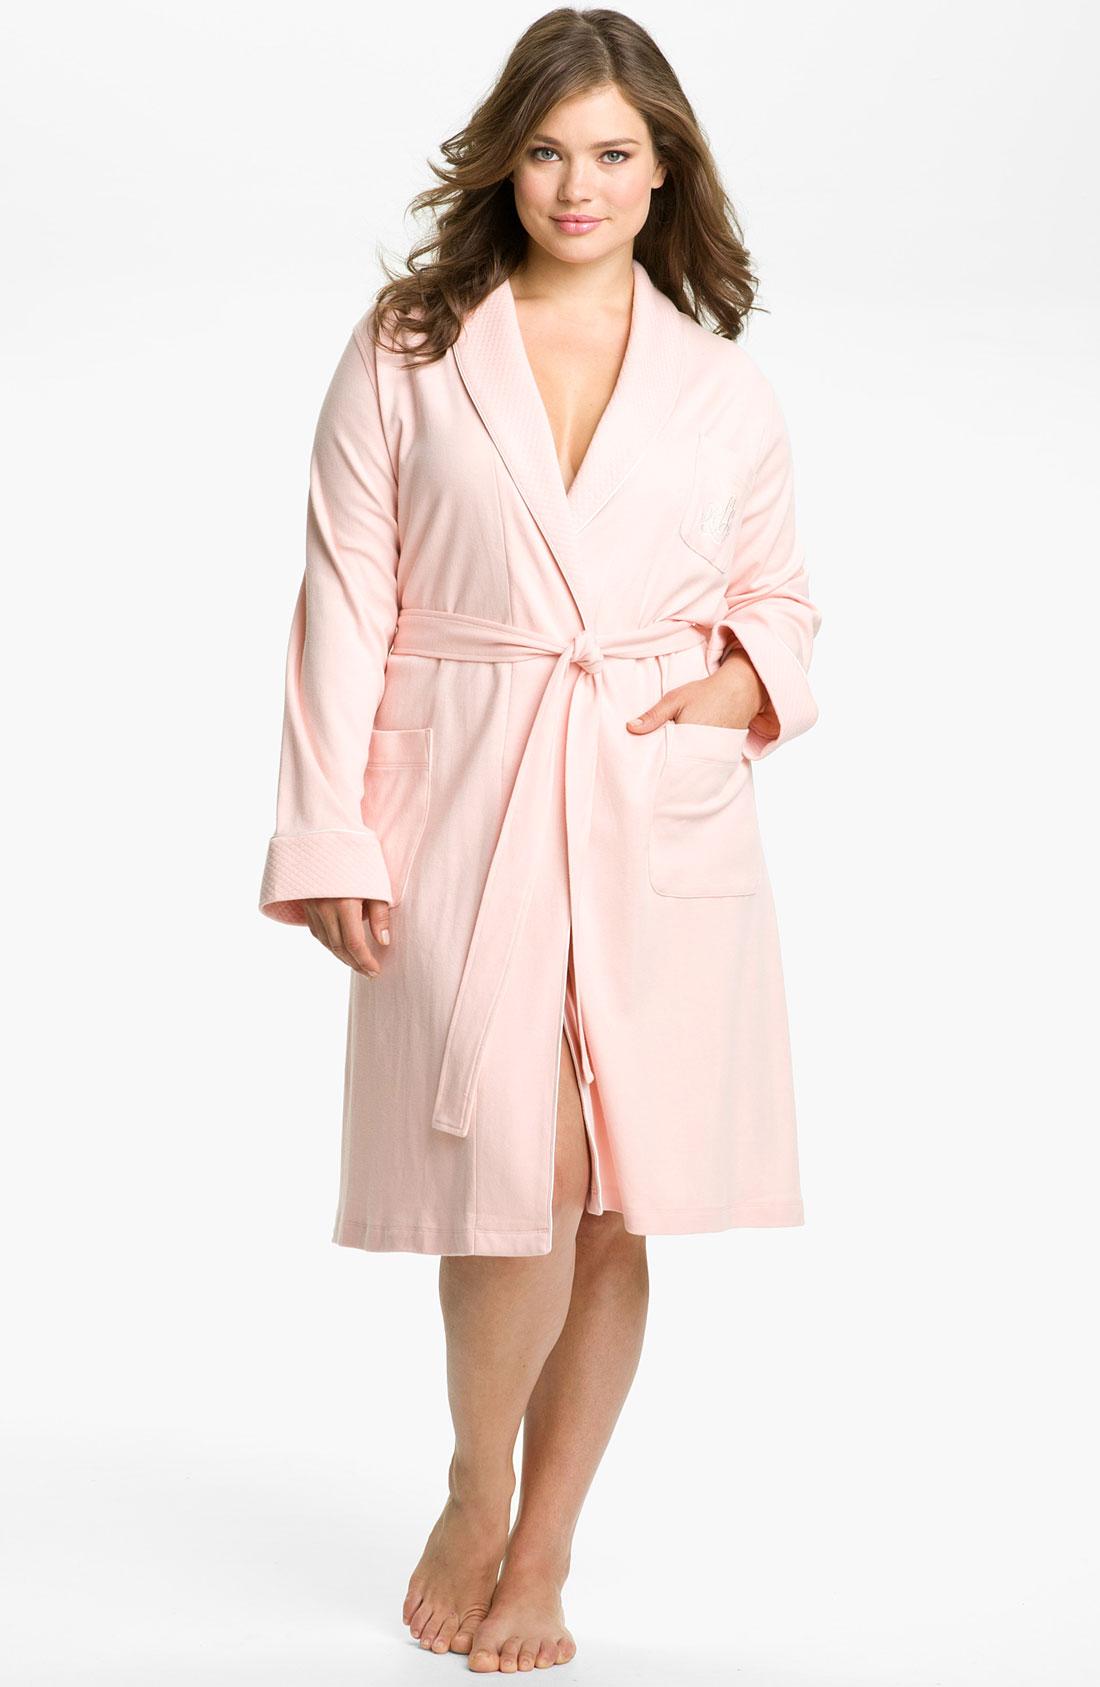 lyst lauren by ralph lauren sleepwear shawl collar robe in pink. Black Bedroom Furniture Sets. Home Design Ideas